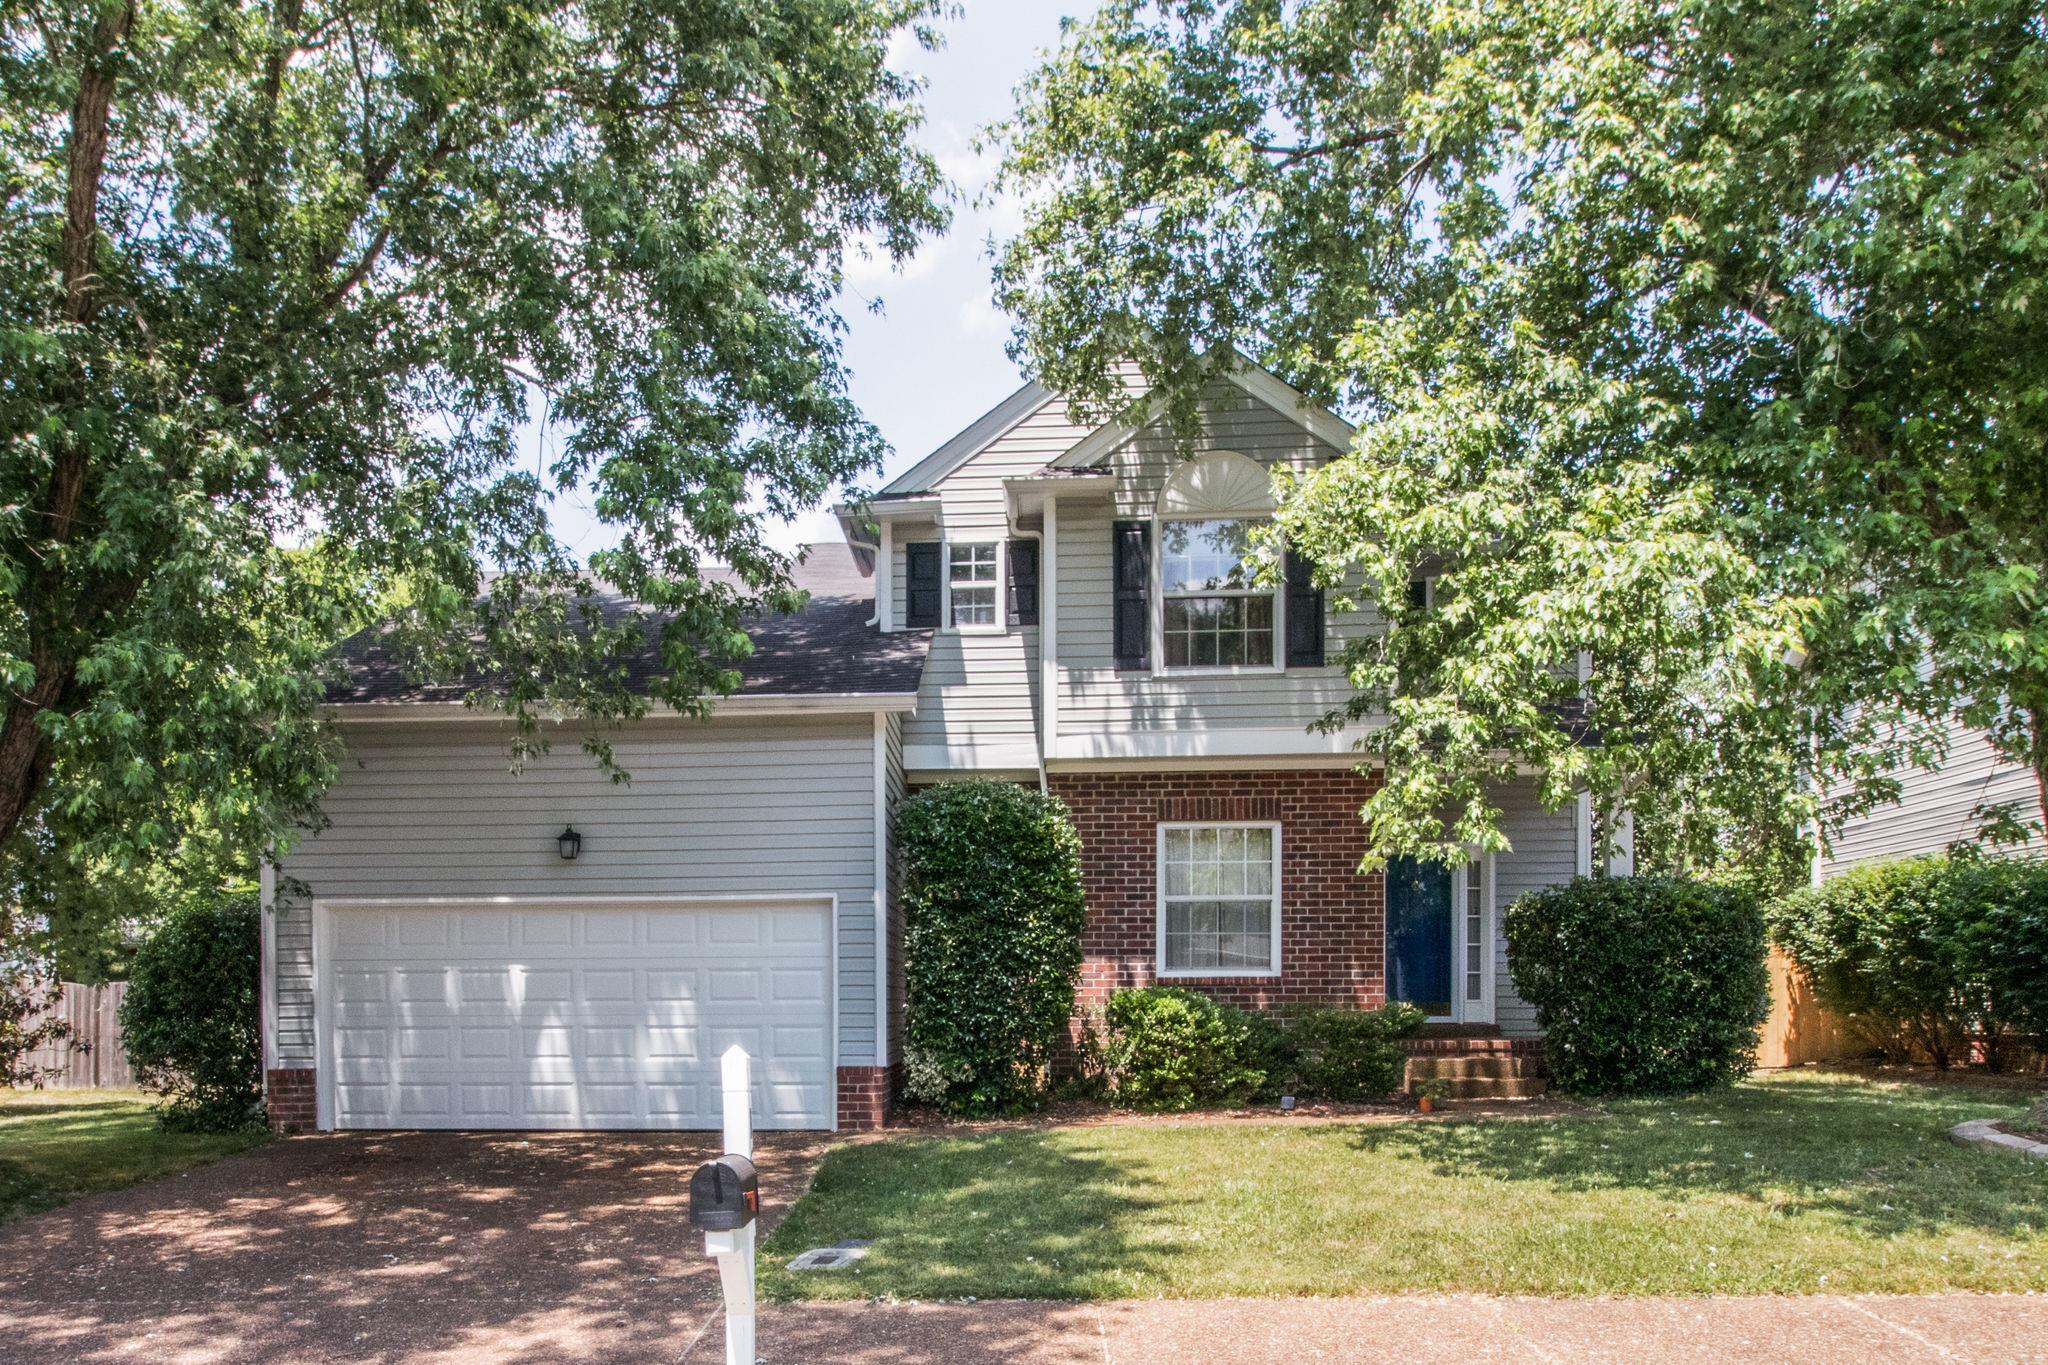 169 Cavalcade Cir, Franklin, TN 37069 - Franklin, TN real estate listing